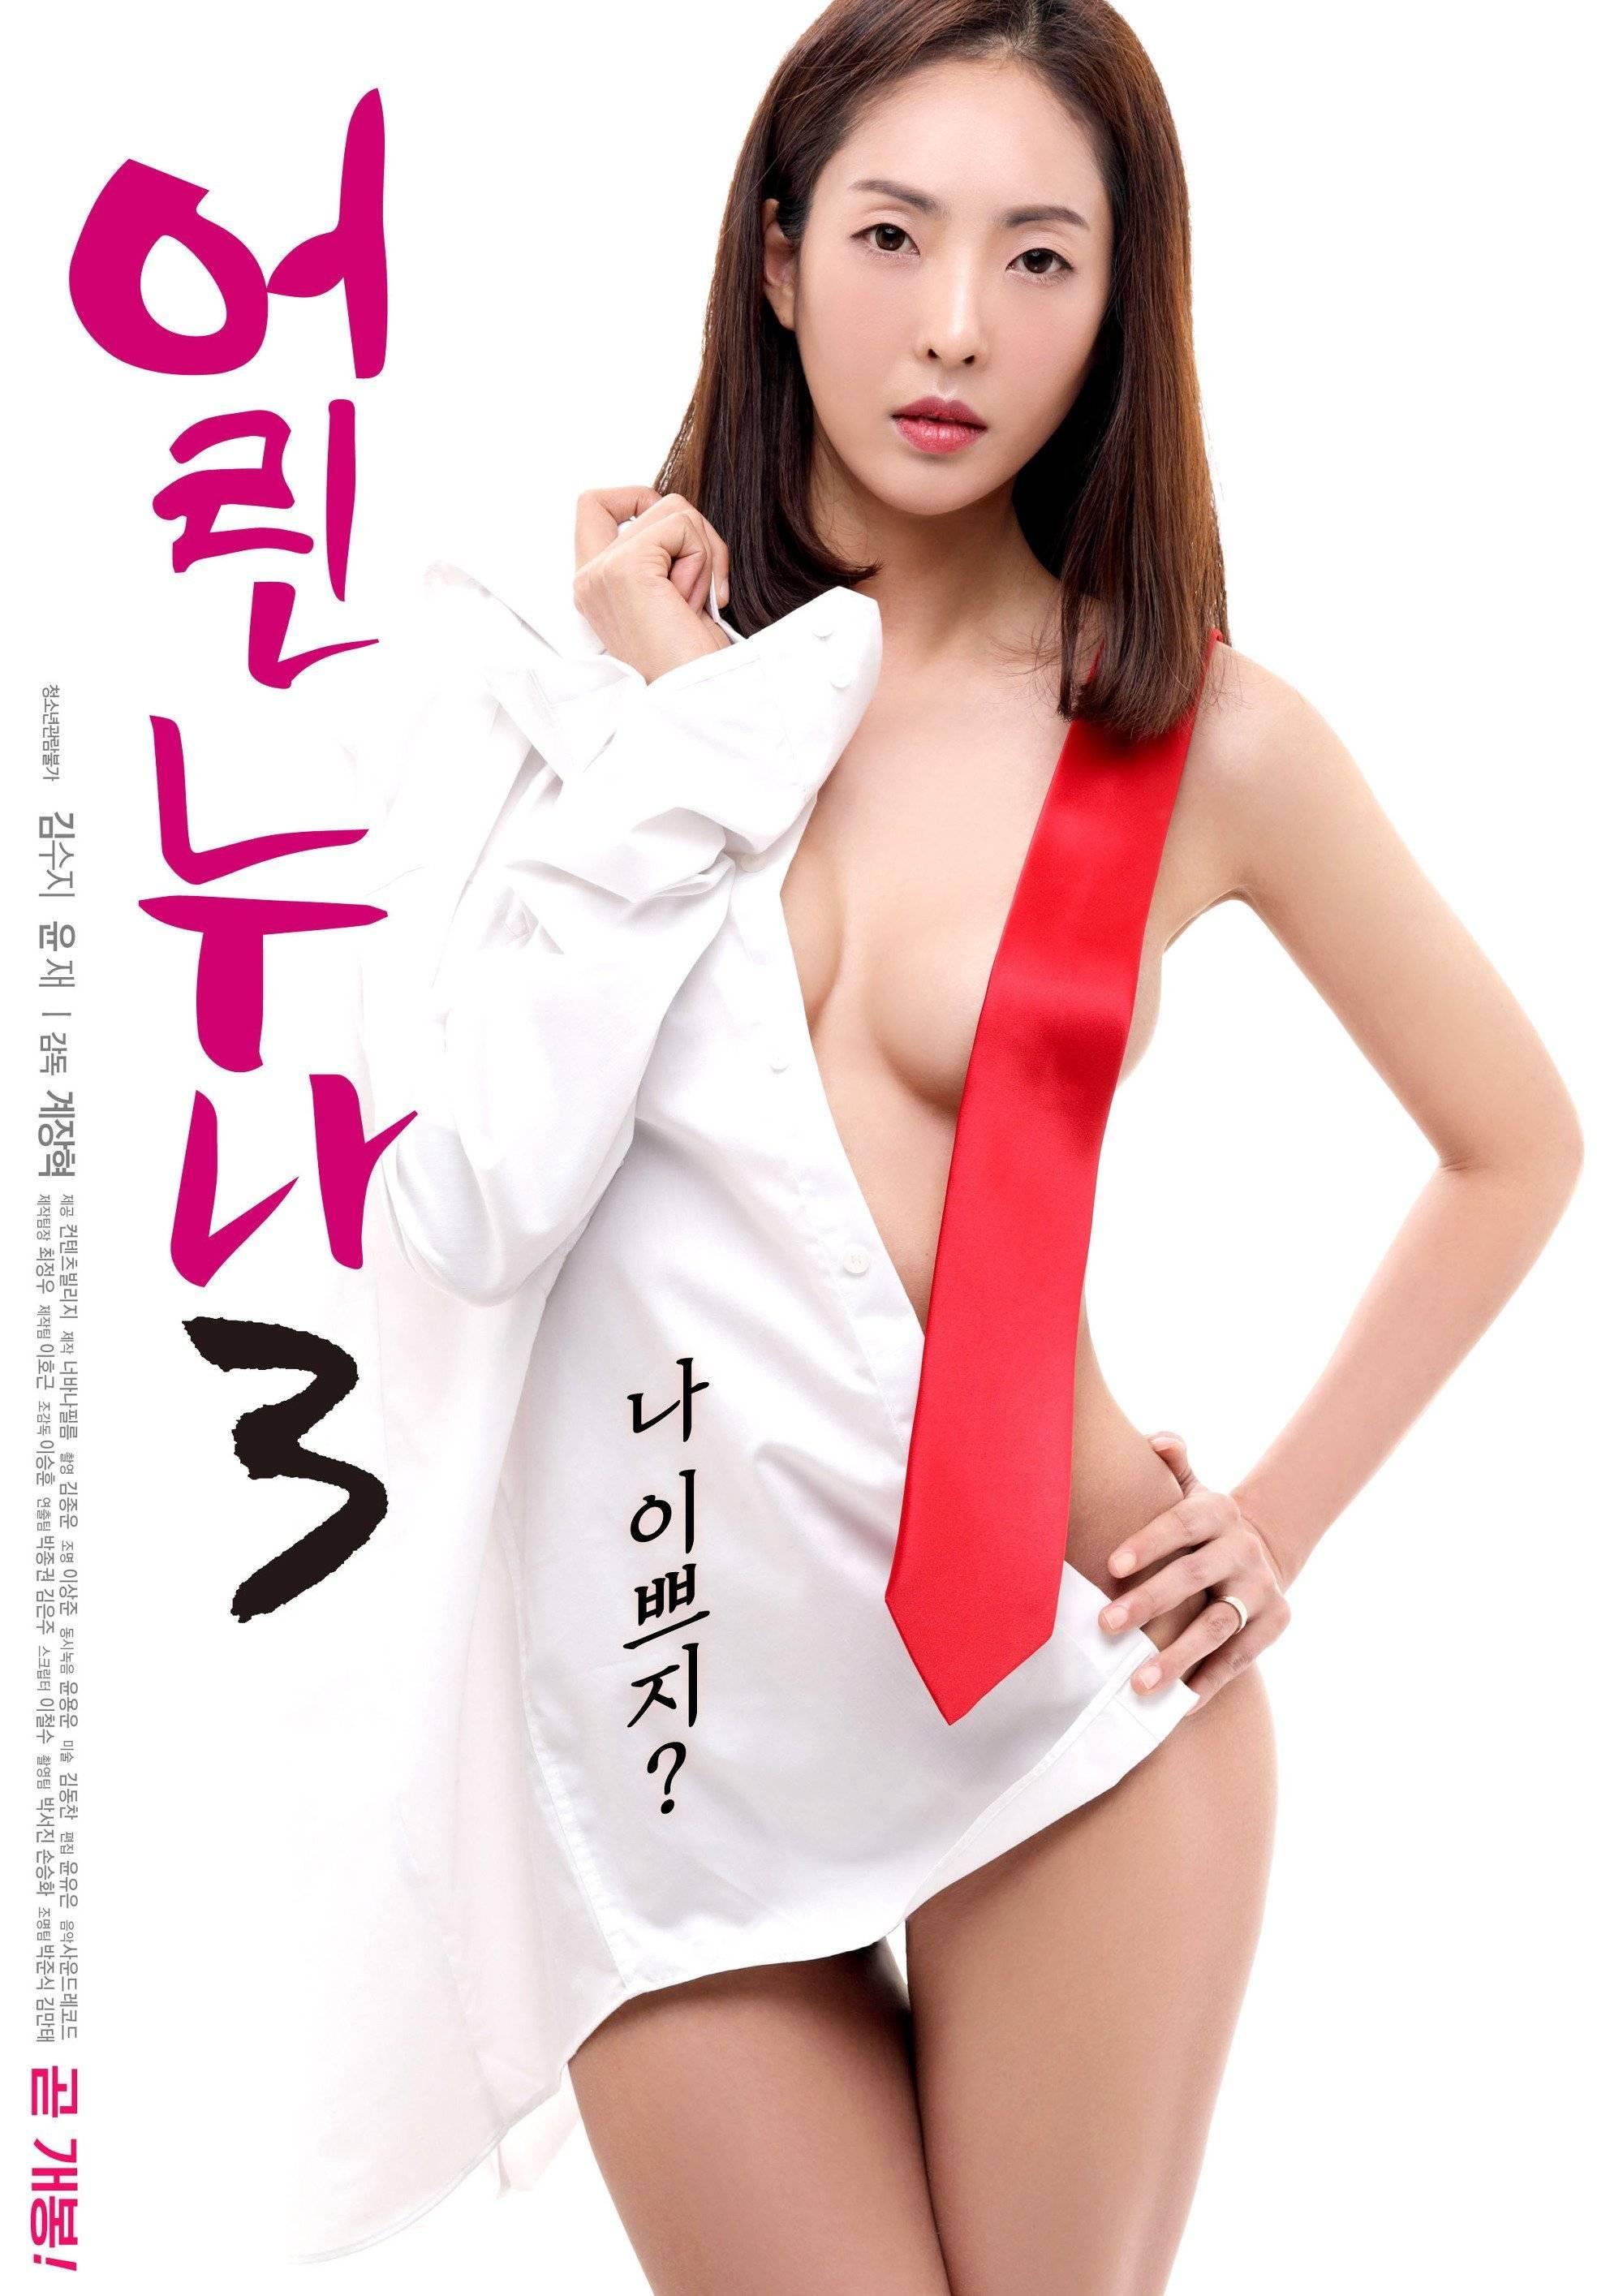 Korean Movie Opening Today 2019/05/17 in Korea @ HanCinema